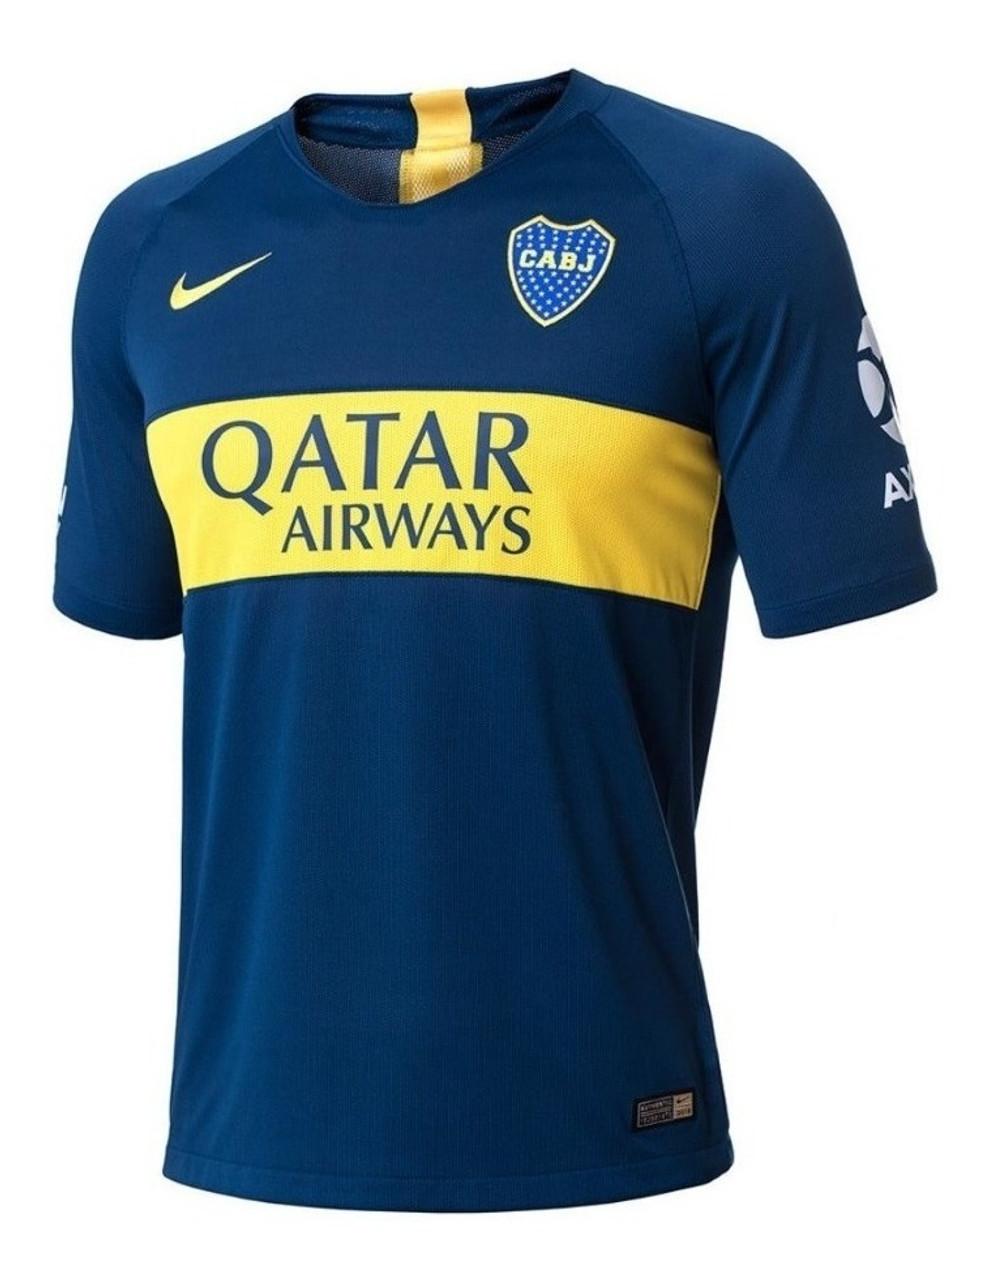 separation shoes 751c7 bbb9d Boca Juniors Official Soccer Men's Camiseta Jersey, 2019